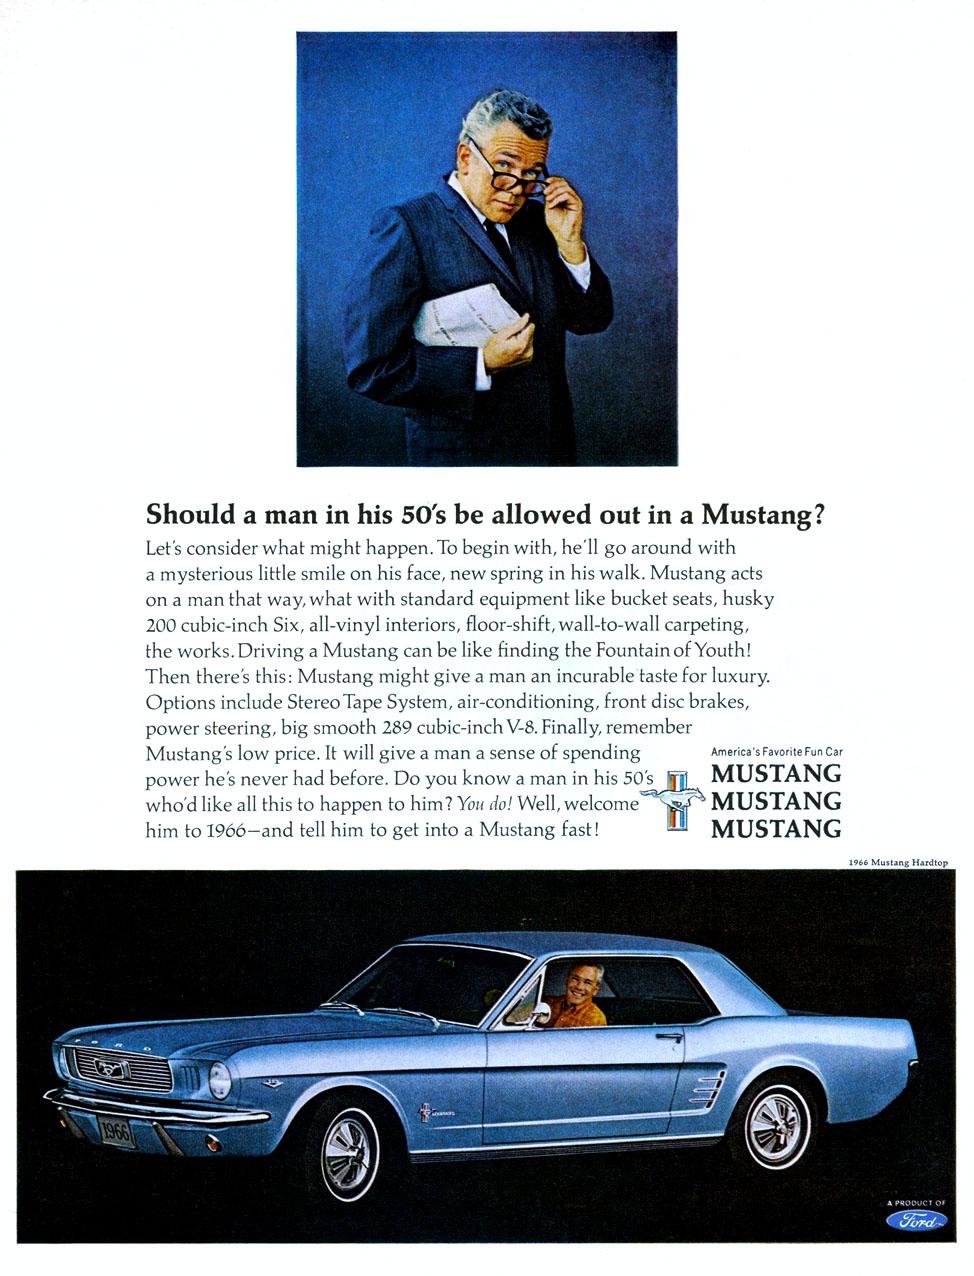 1966 Mustang - America's favourite fun car